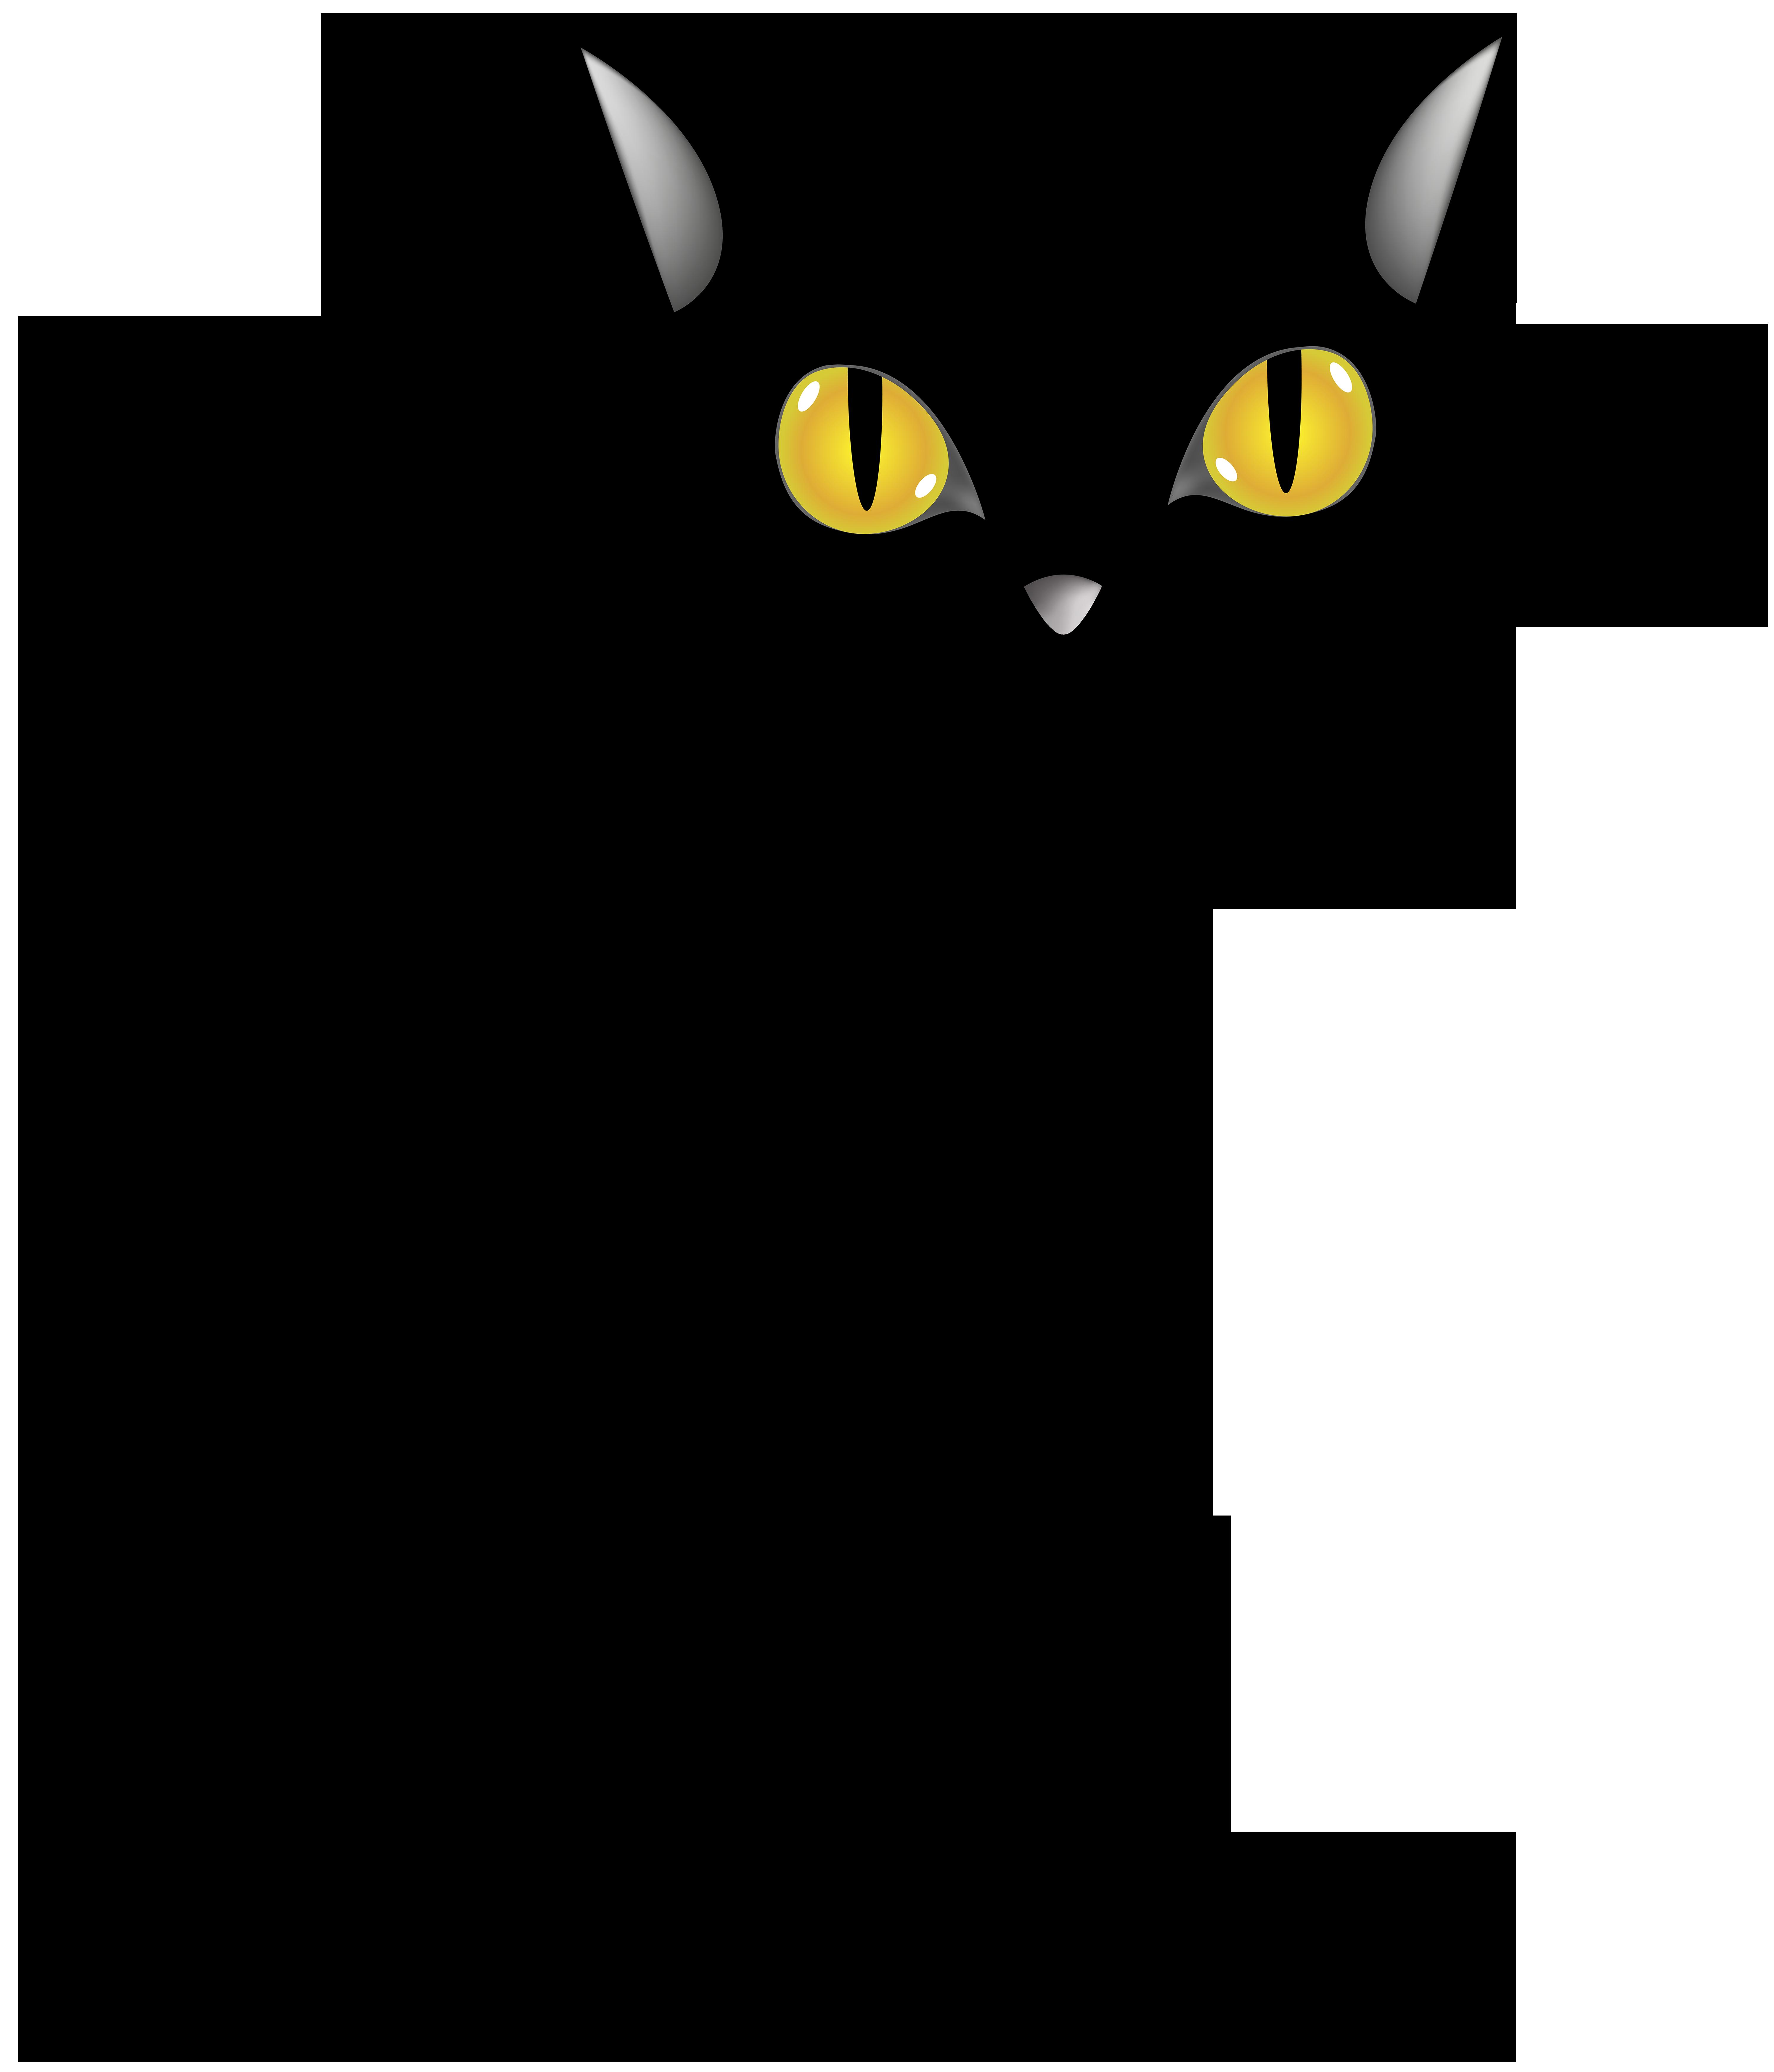 Halloween Black Cat PNG Clip Art Image.